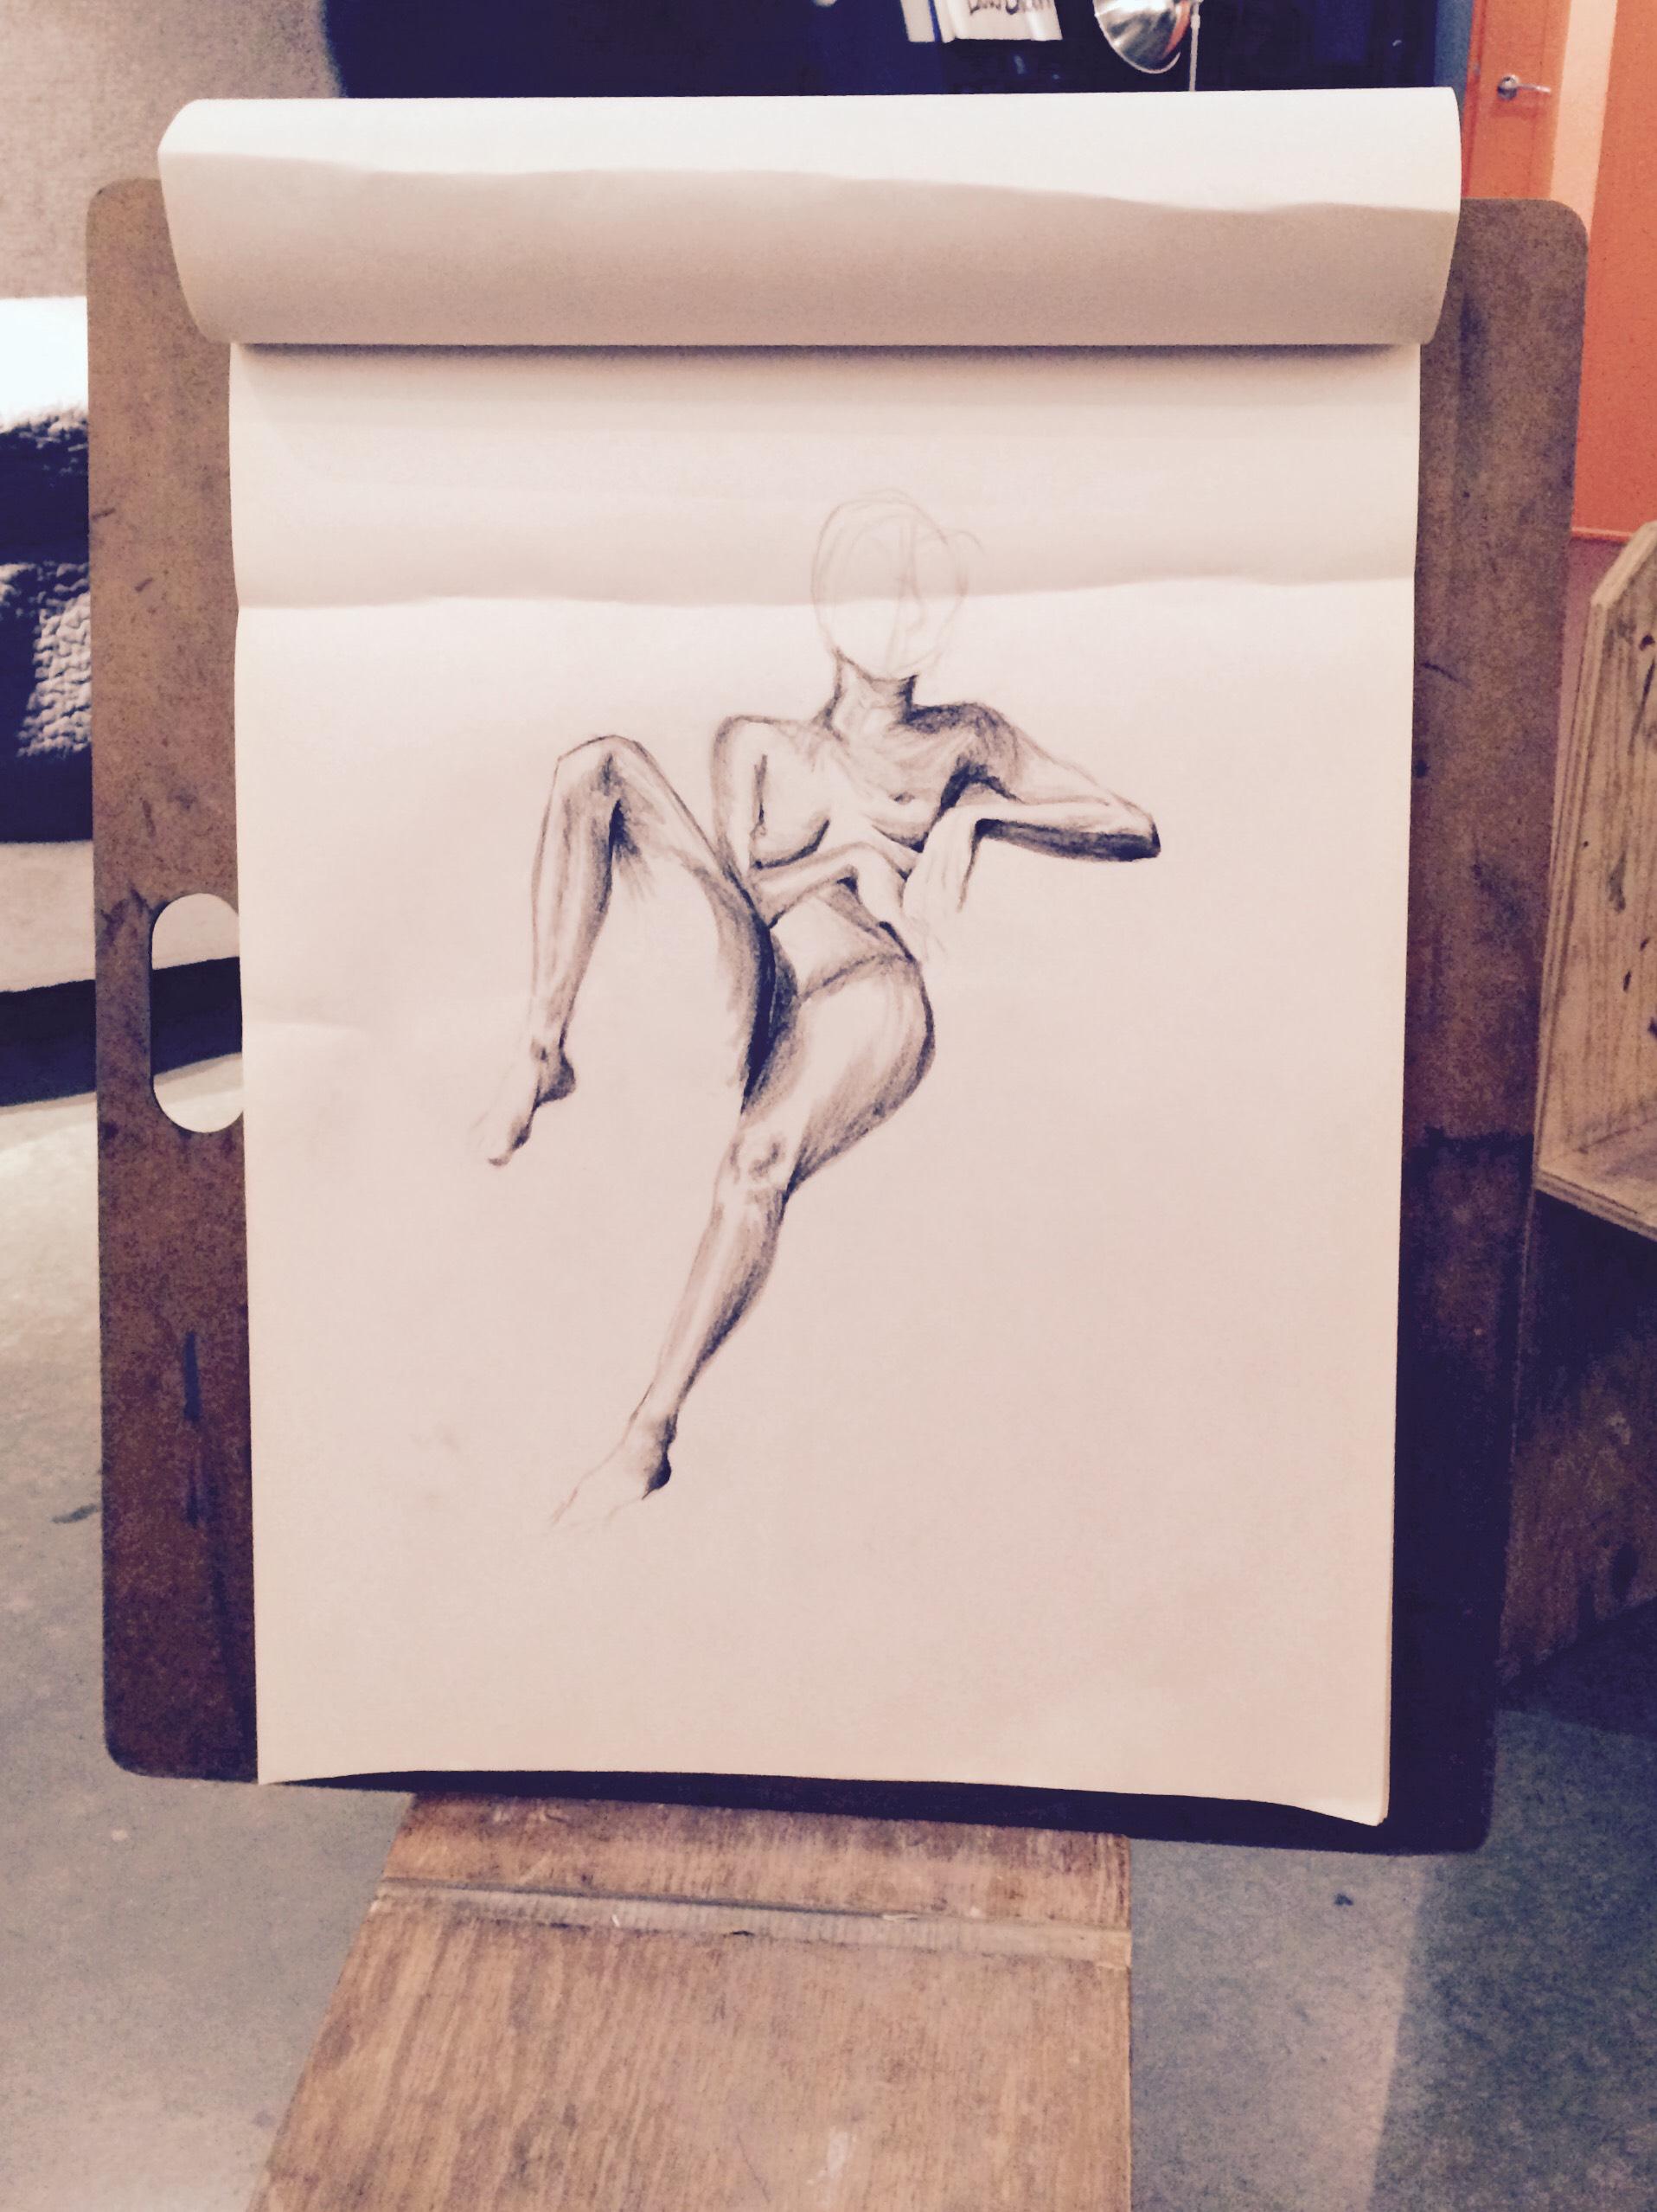 30 Minute Sketch 1 of 4